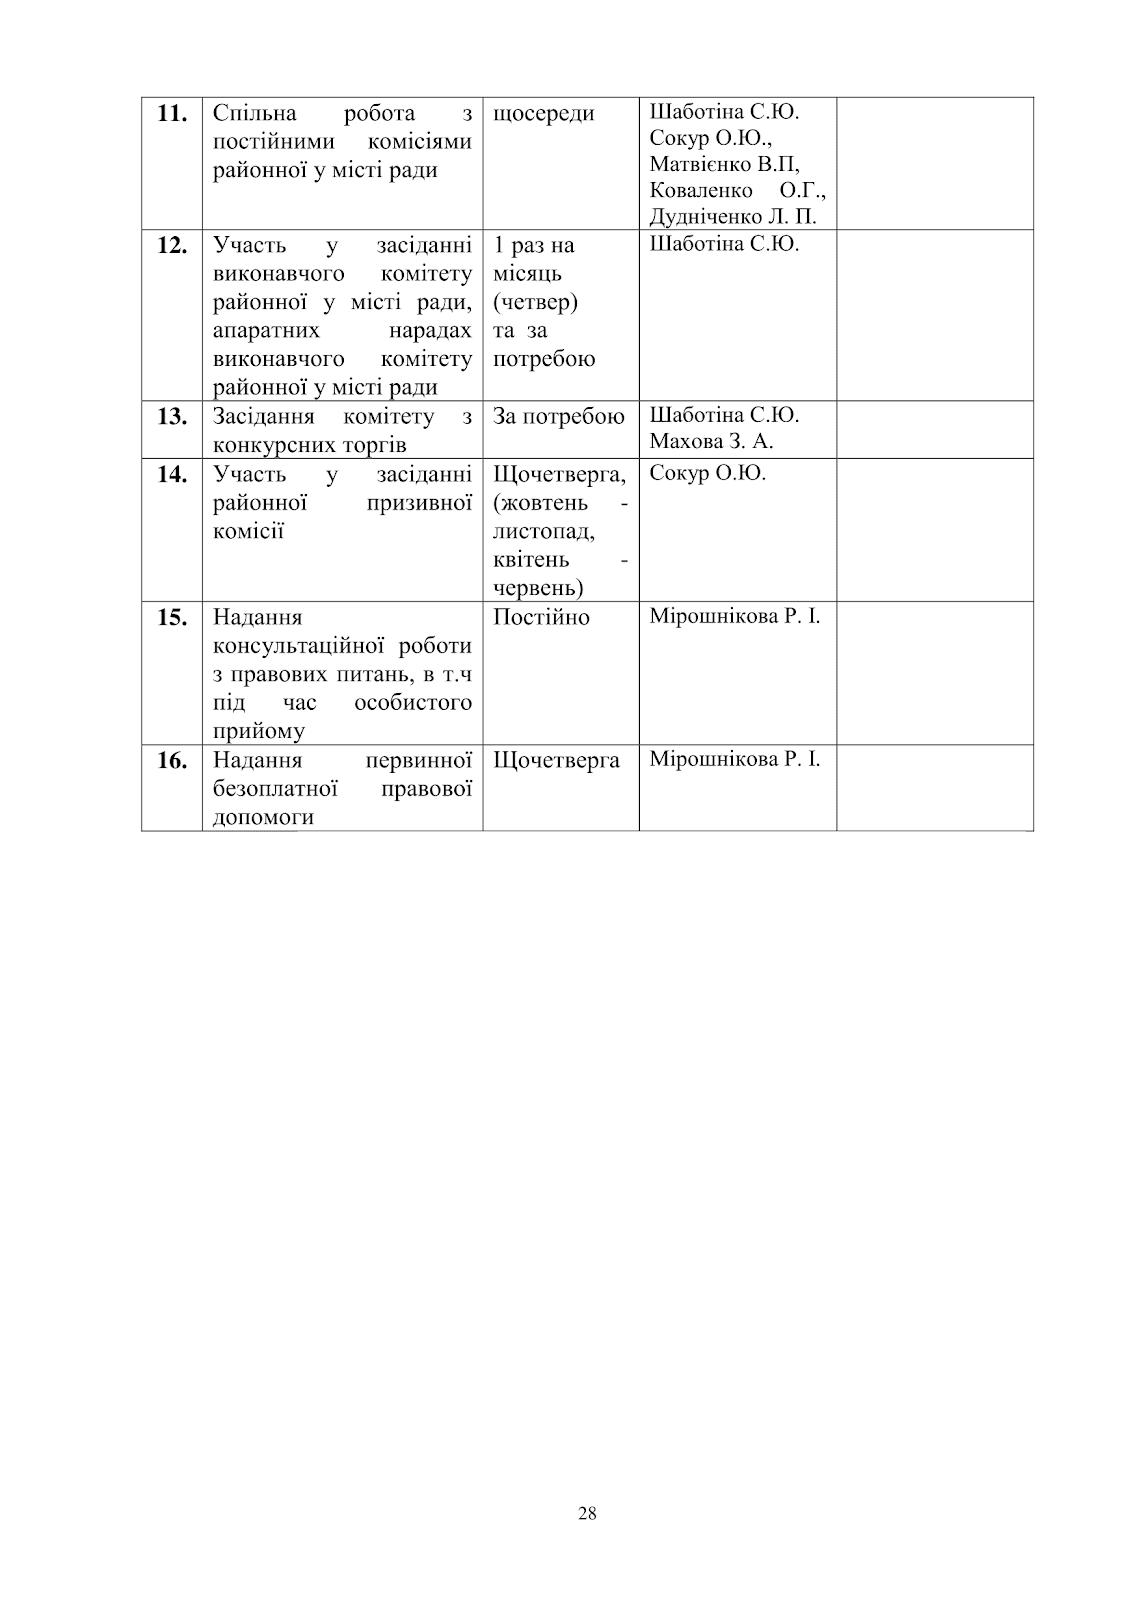 C:\Users\Валерия\Desktop\план 2016 рік\план 2016 рік-028.png